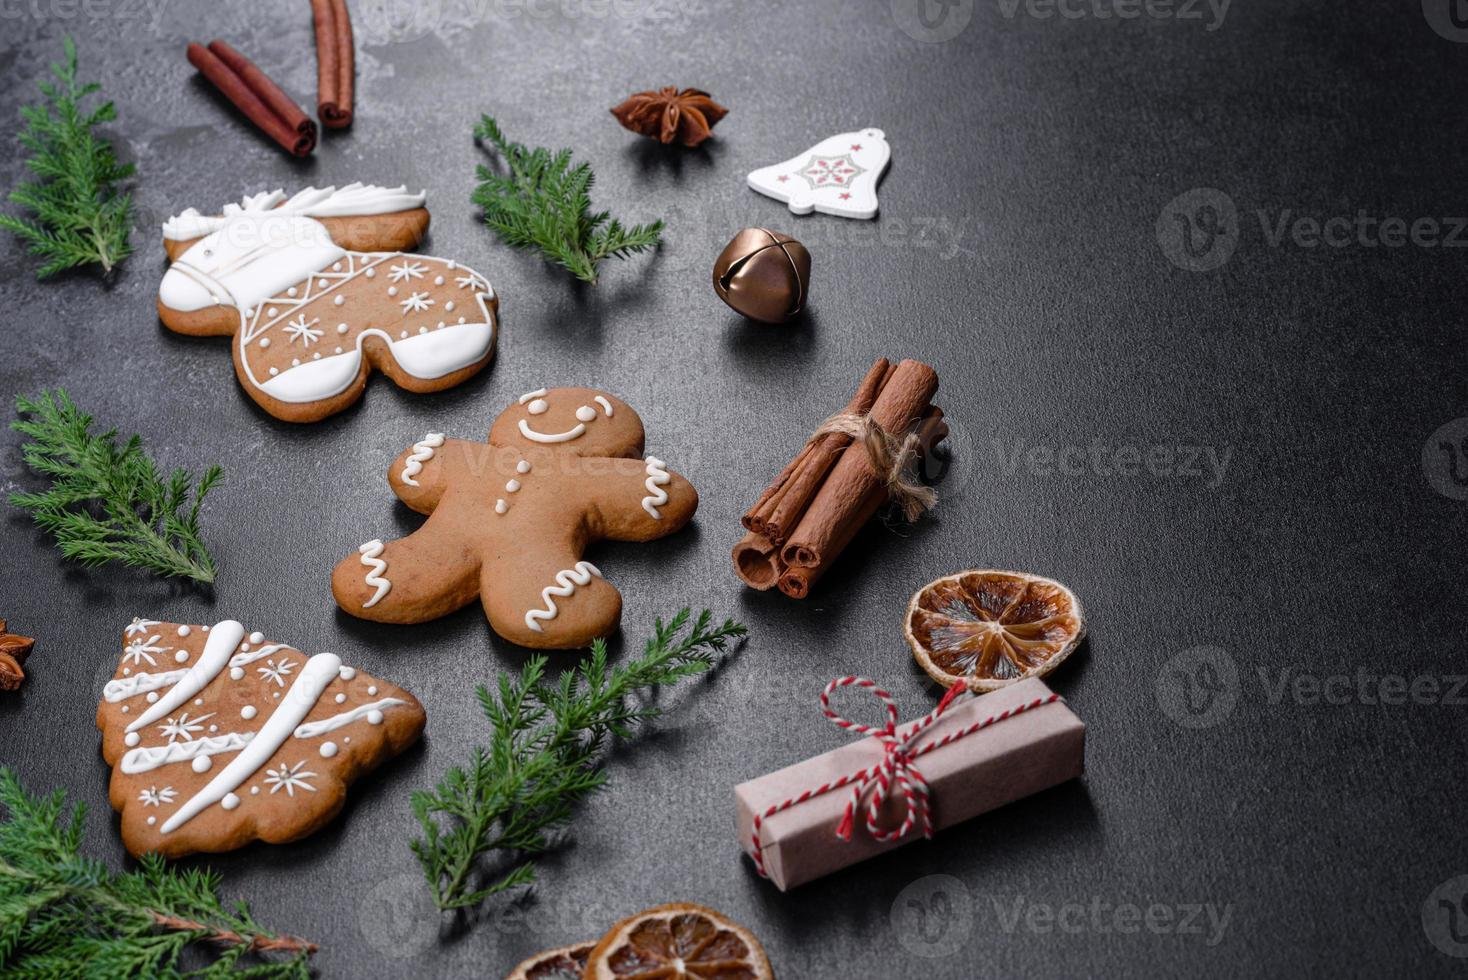 Pan de jengibre festivo navideño hecho en casa sobre una mesa oscura foto